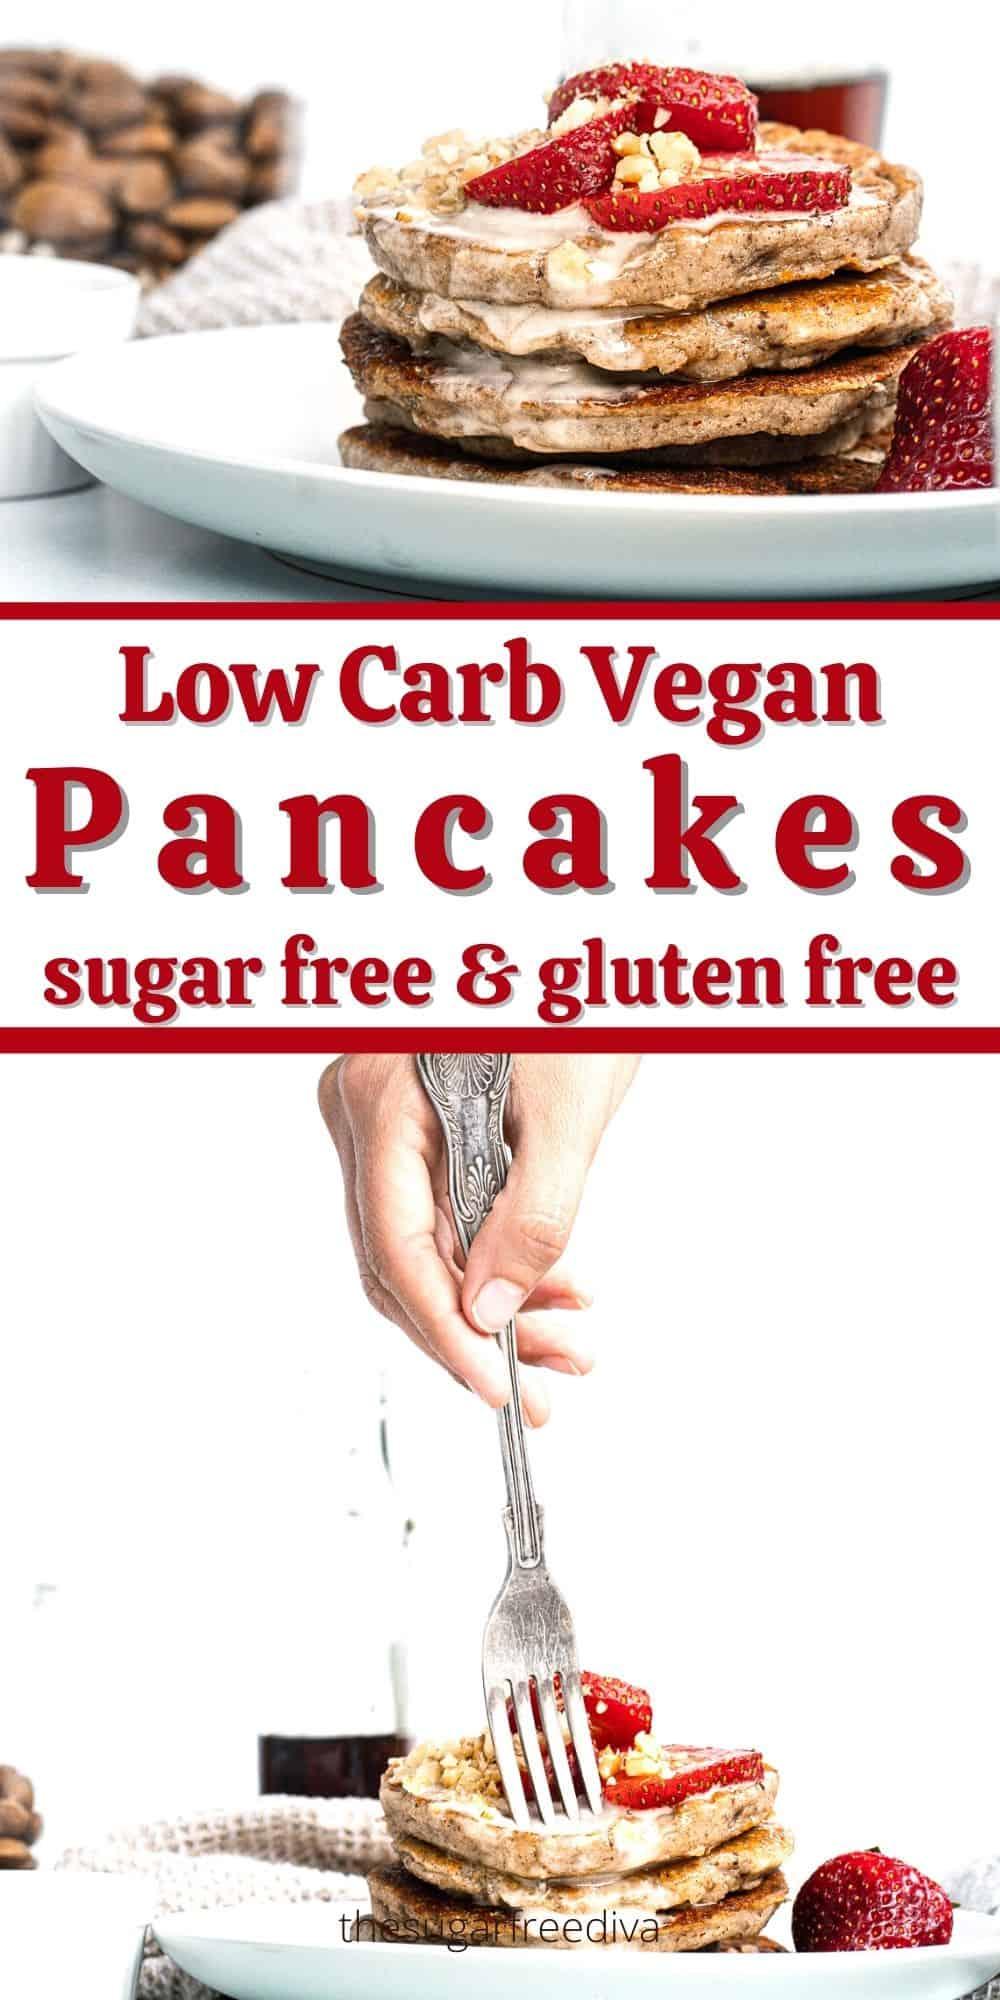 Delicious Low Carb Vegan Pancakes